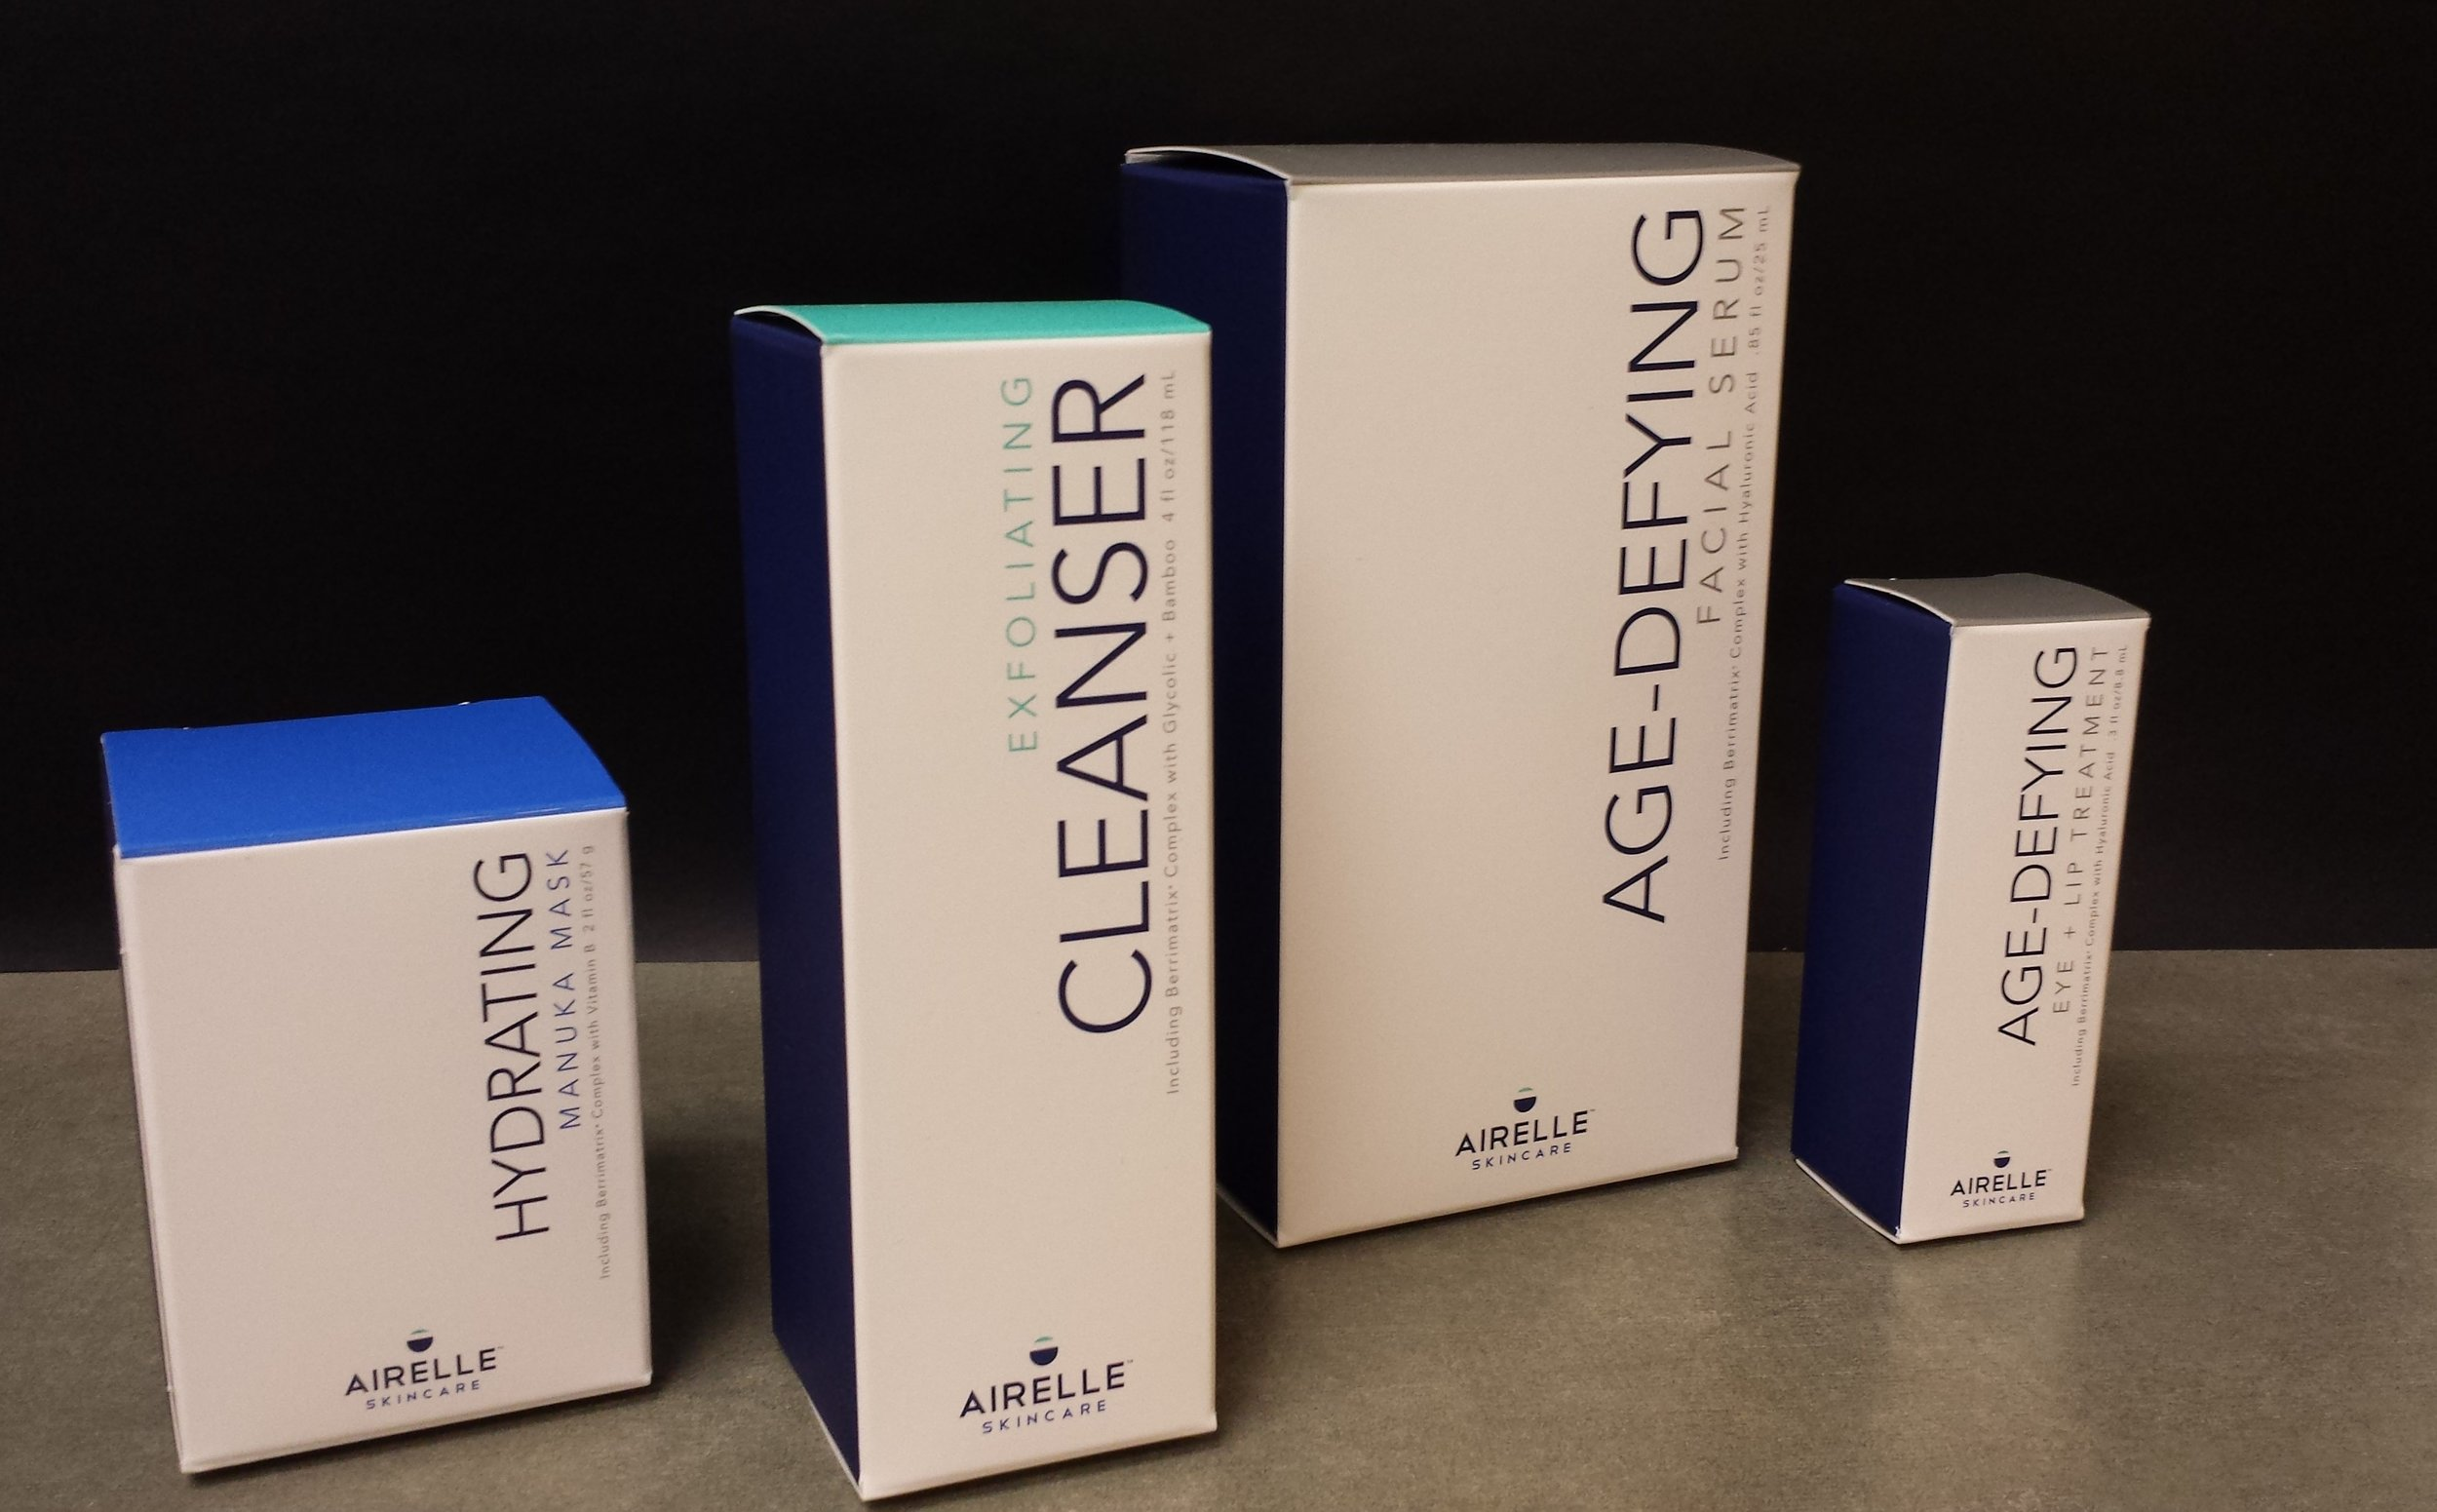 Airelle Skincare cartons